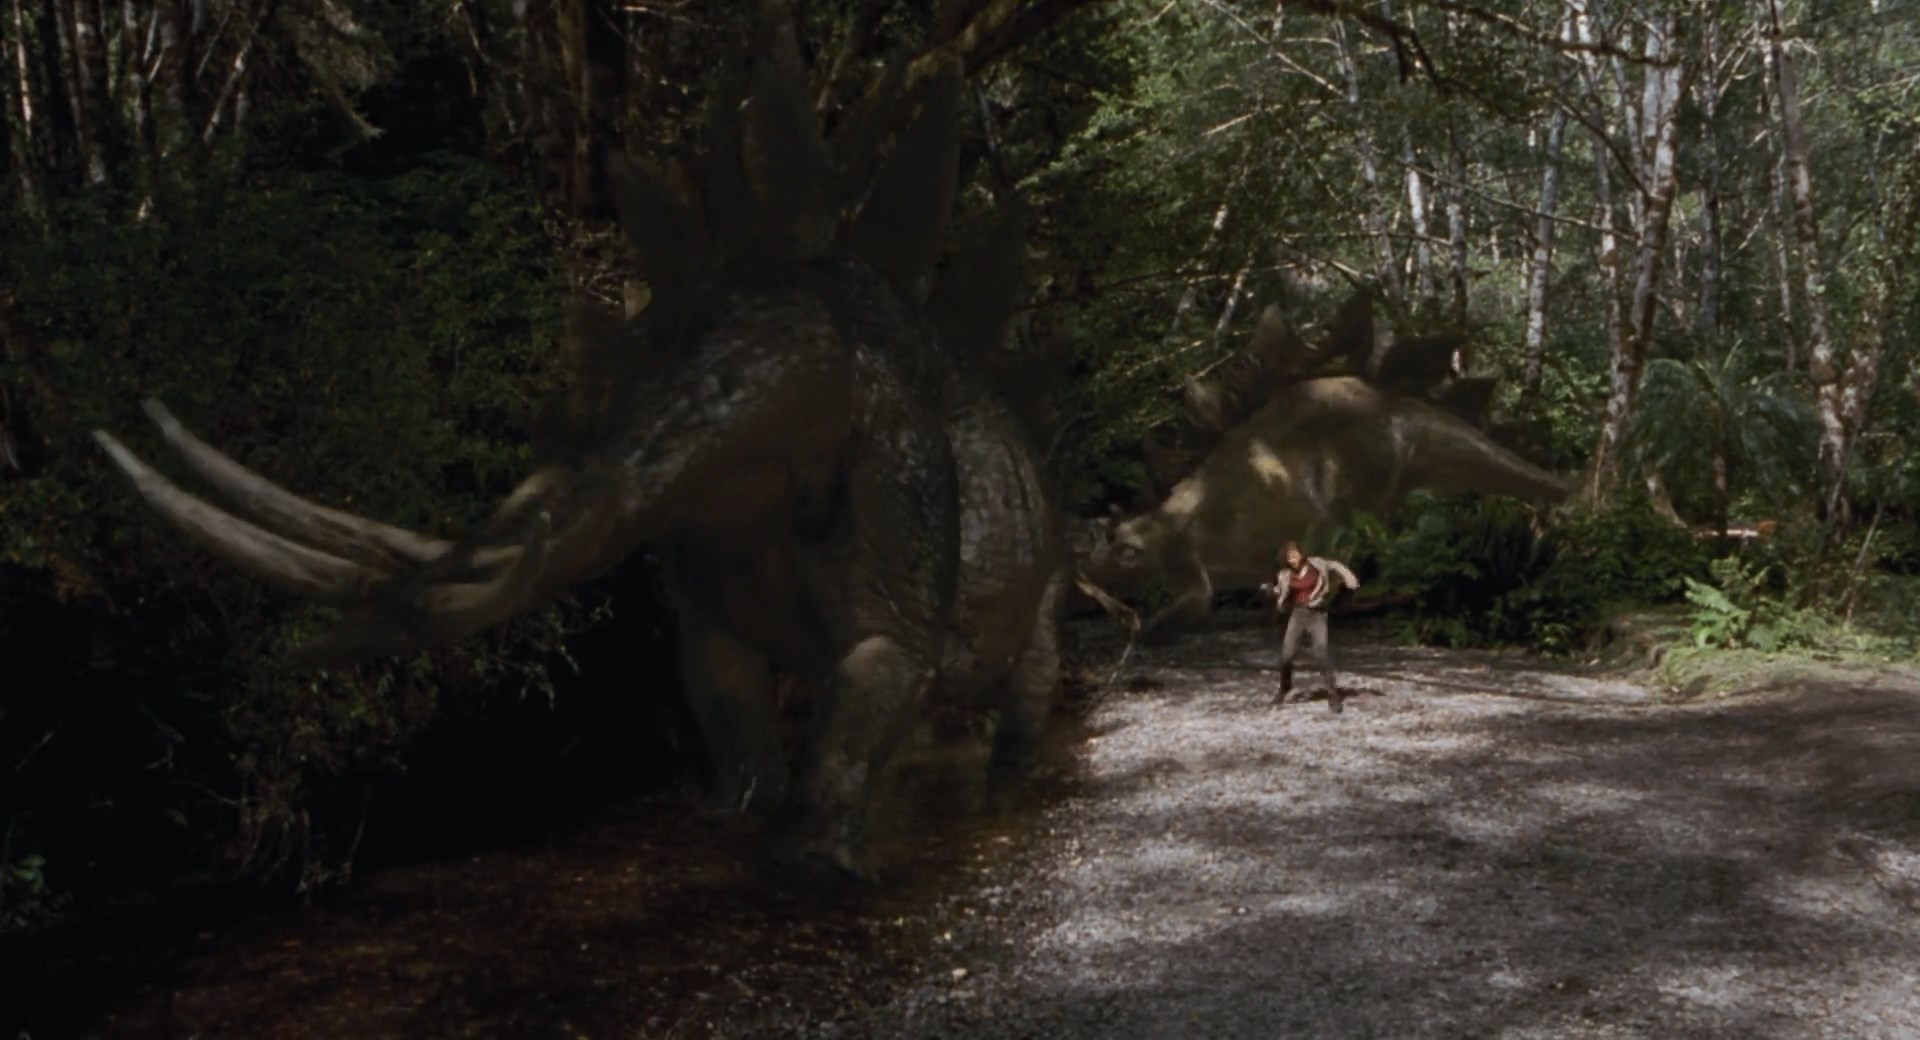 stegosaurus04 Stegosaurus